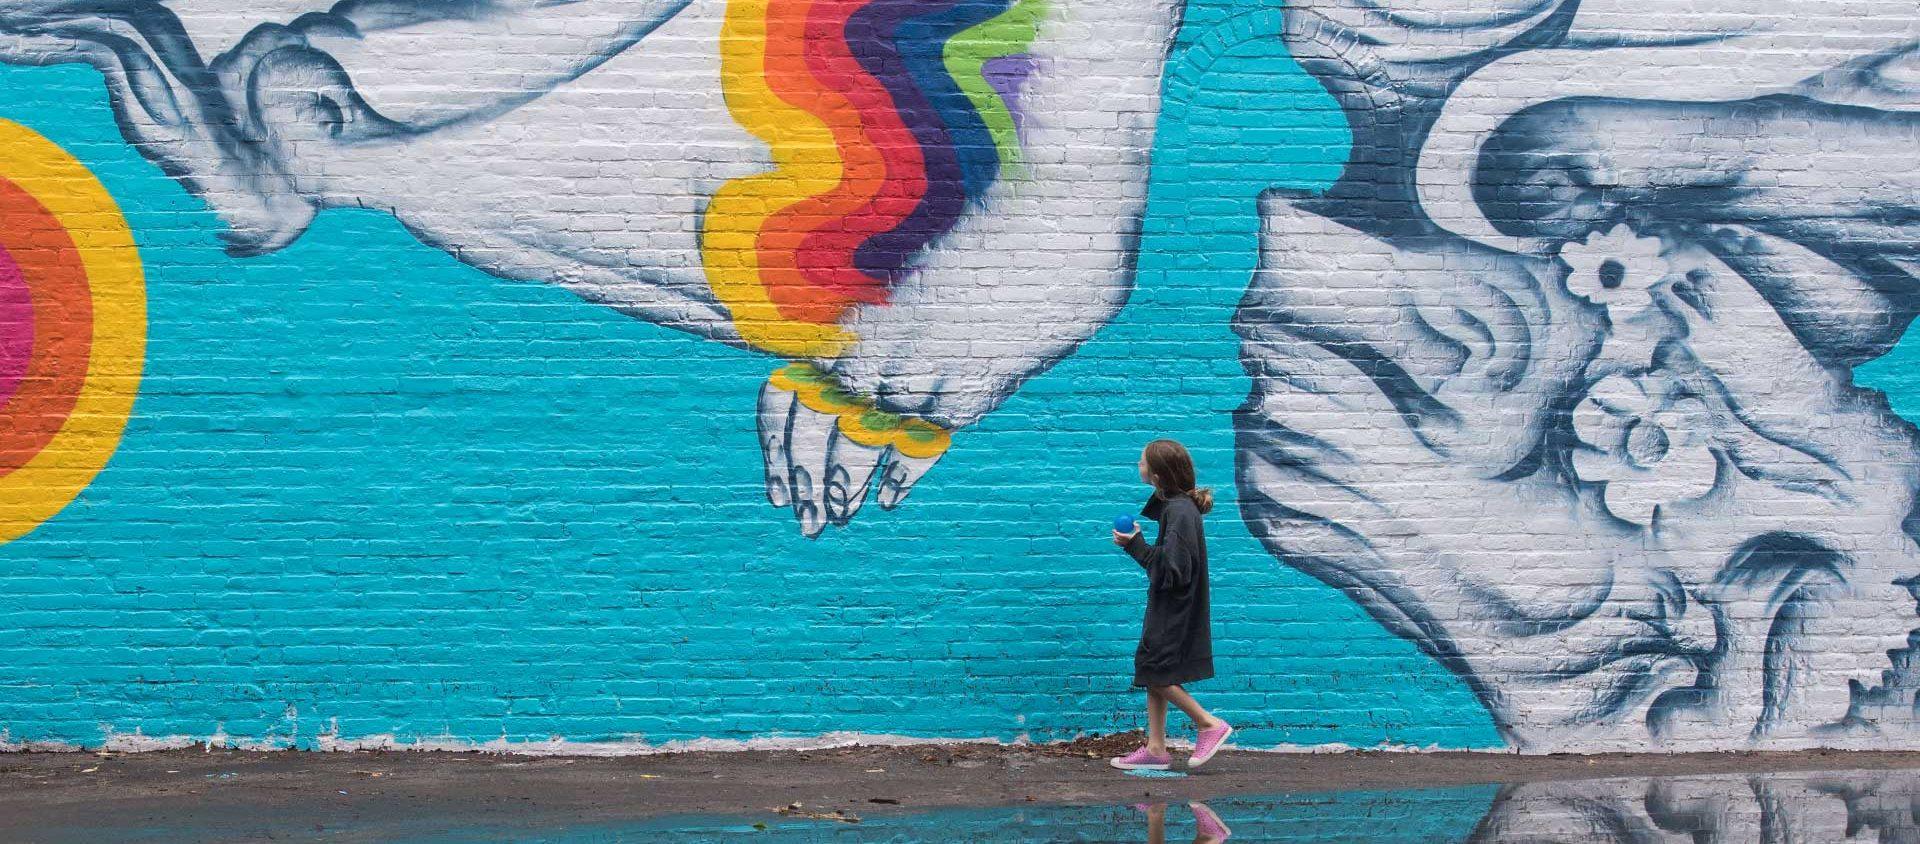 Girl looks at a mural at Beyond Walls Mural Festival, Lynn, MA